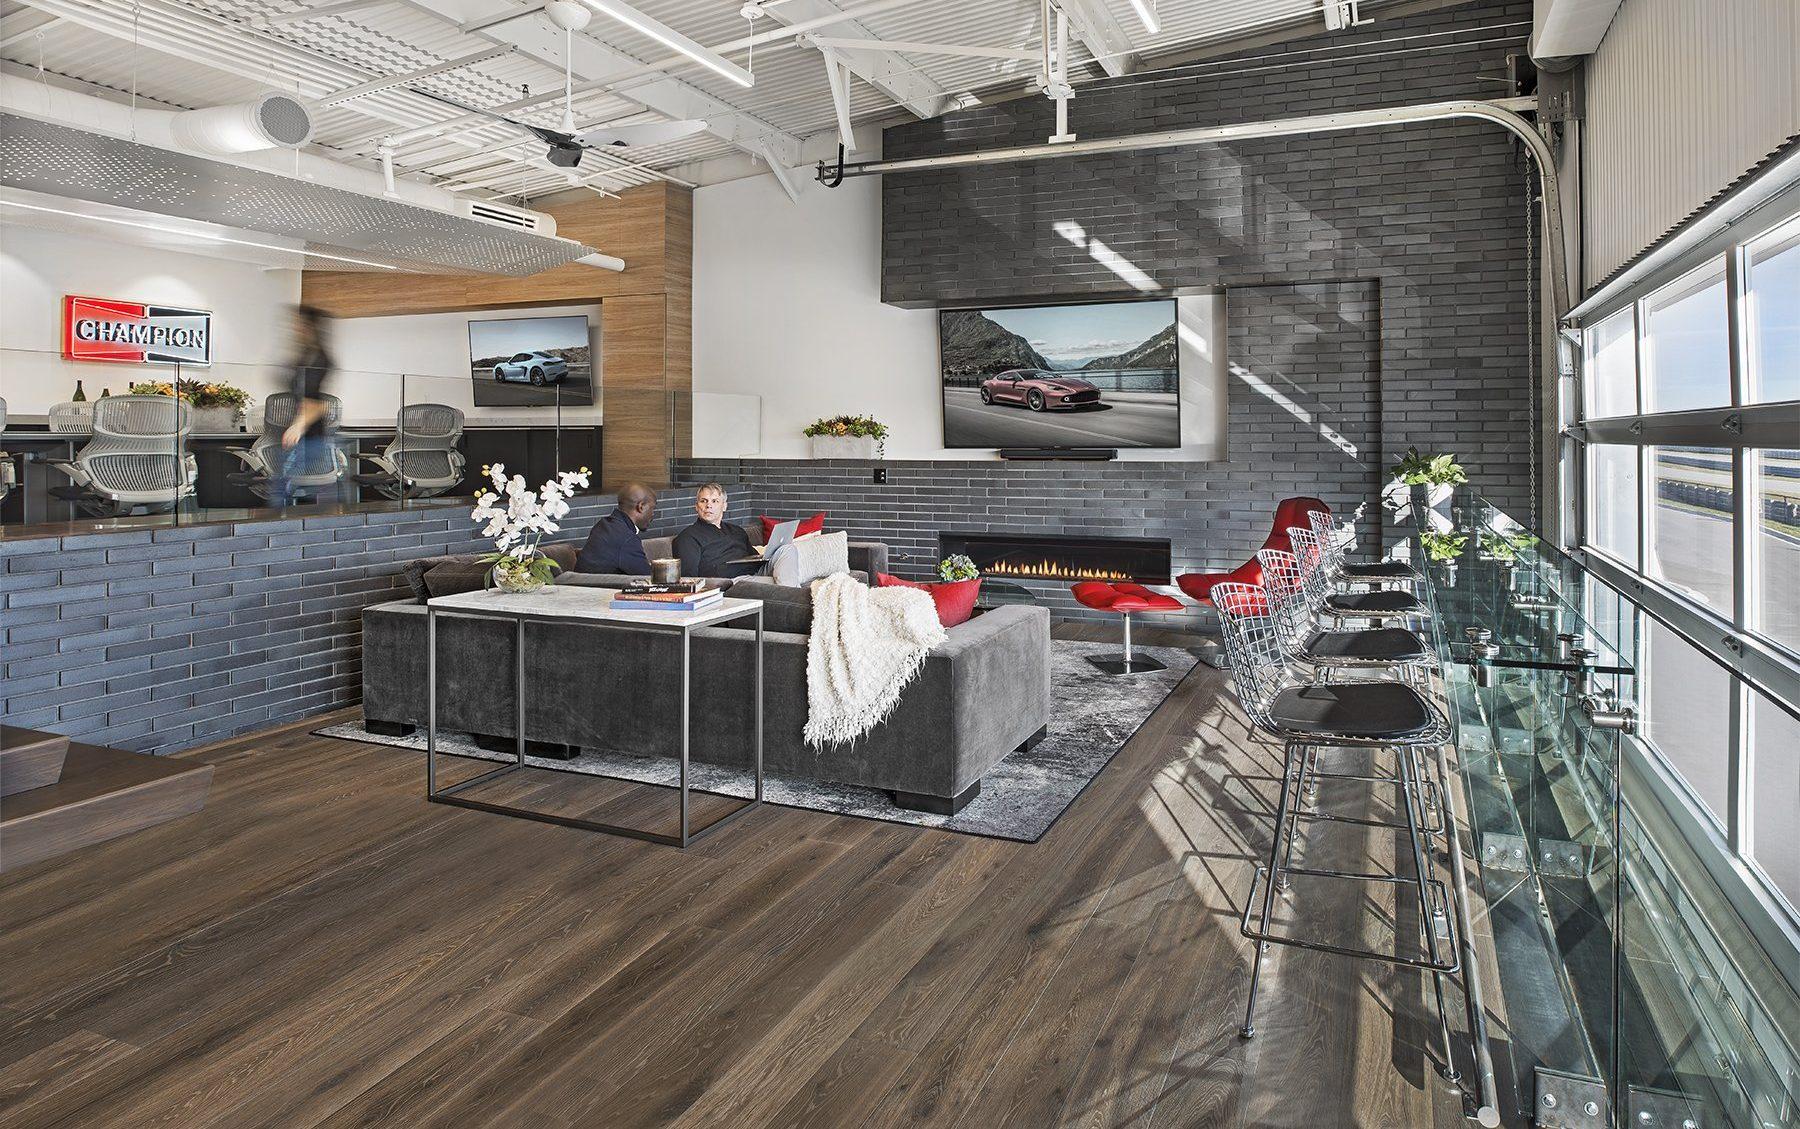 Interior view of living room at M1 Concourse Car Condos Project in Pontiac Michigan Architecture Interior Design